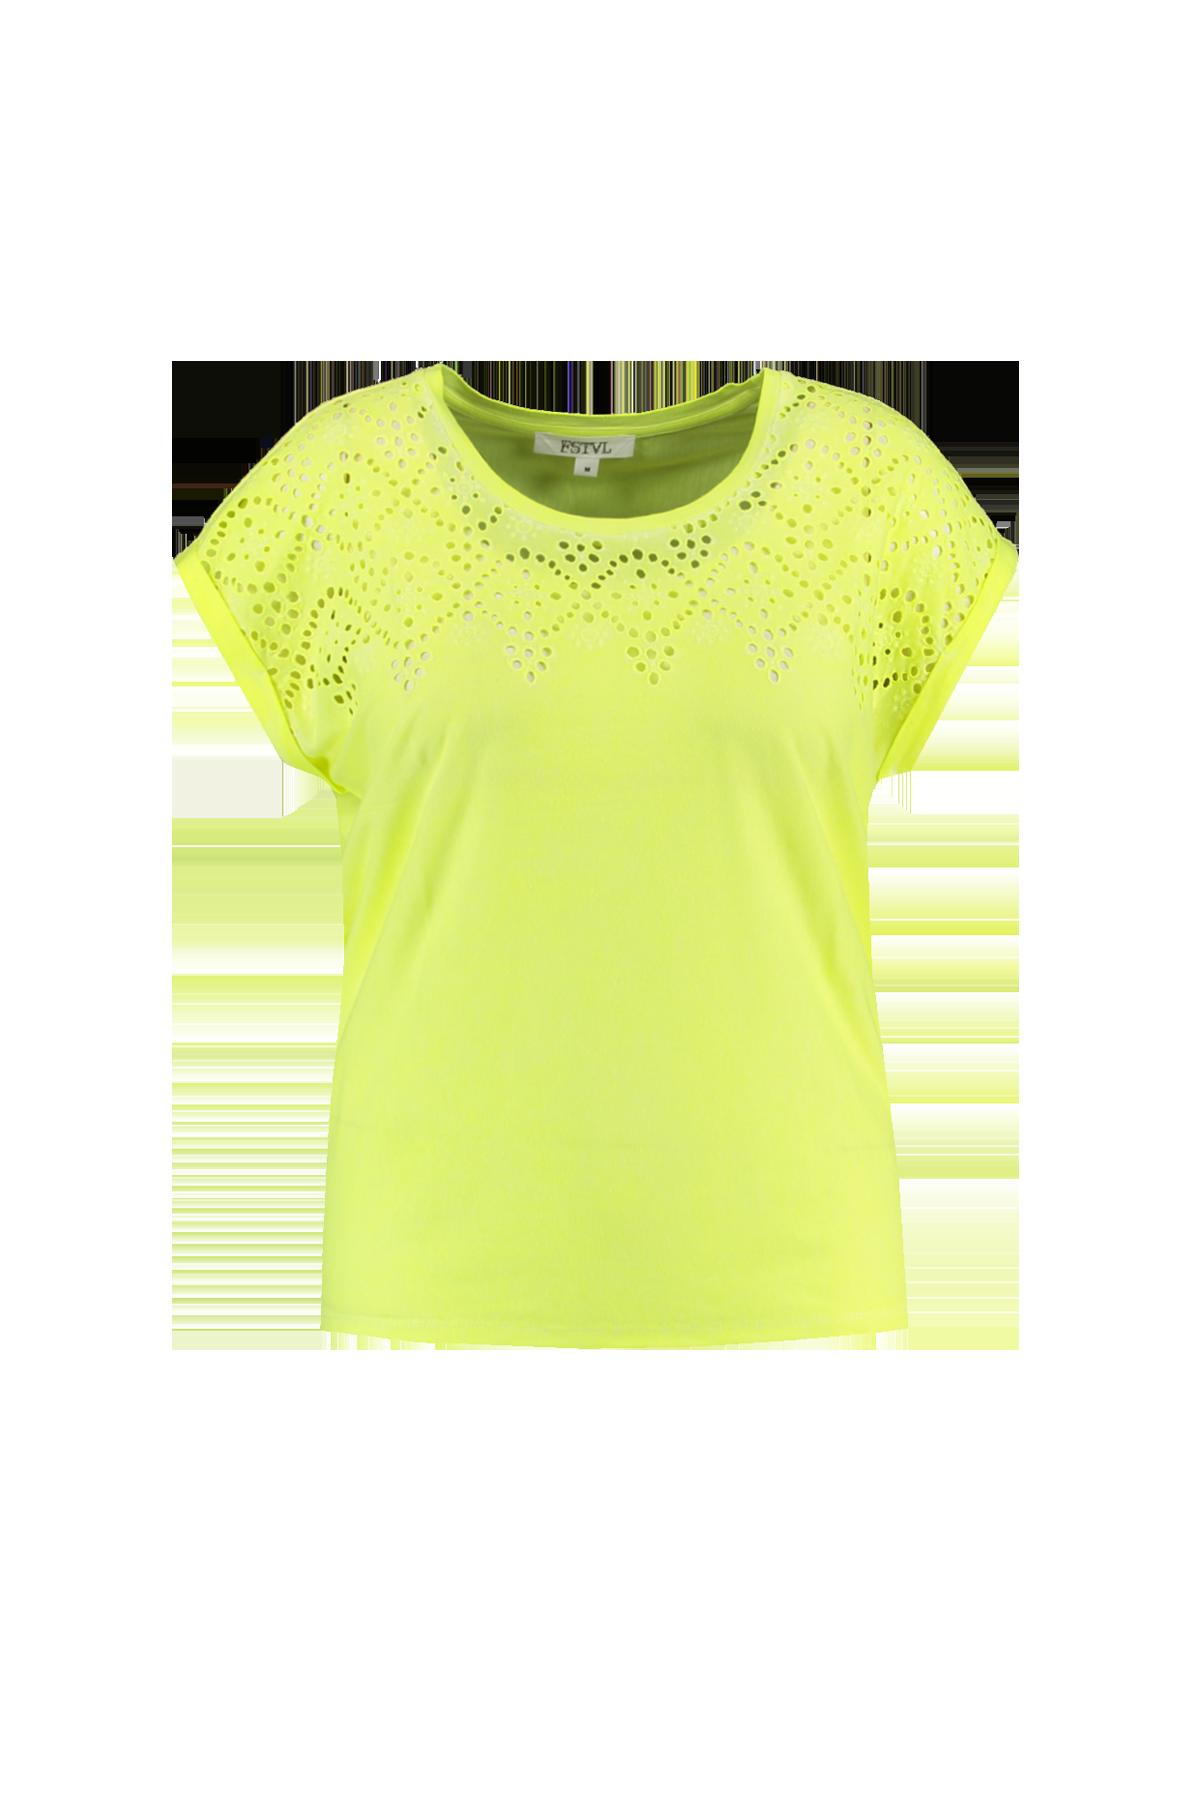 By Mode Dames Embroidery T Groen Fstvl shirt Ms Met lKJF1c